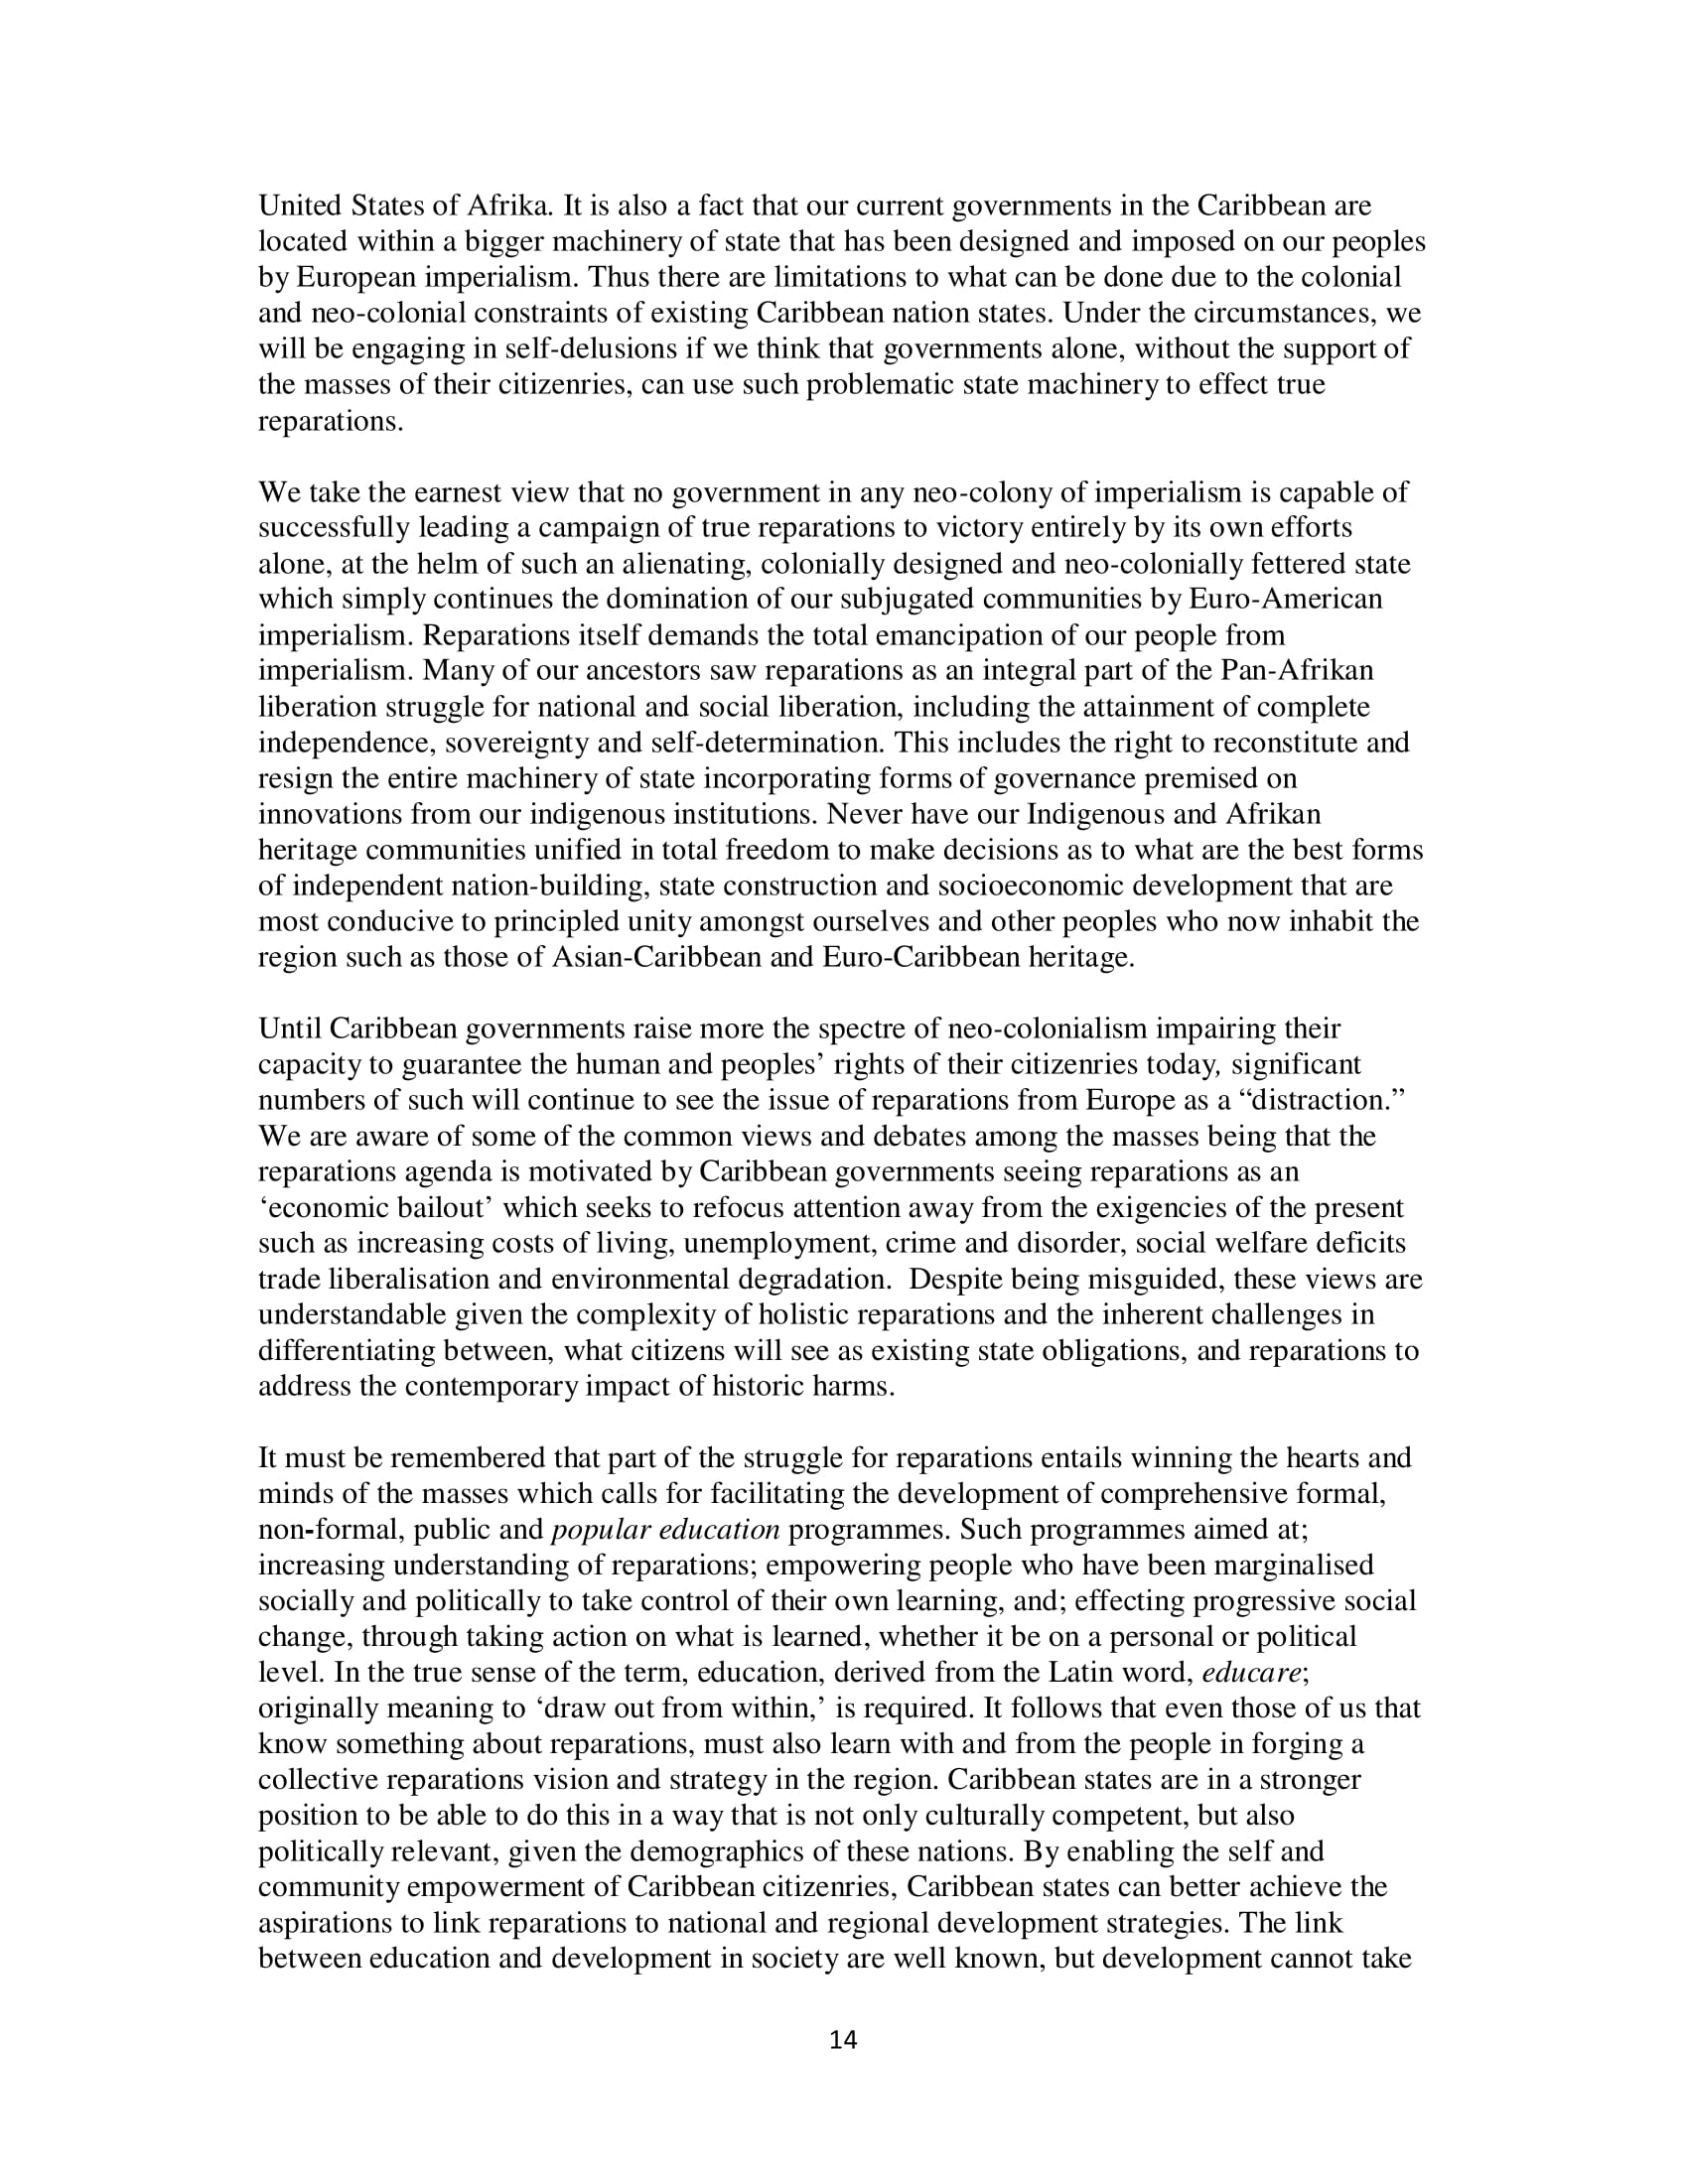 PARCOE CARICOM REPARATIONS POSITION PAPER-14